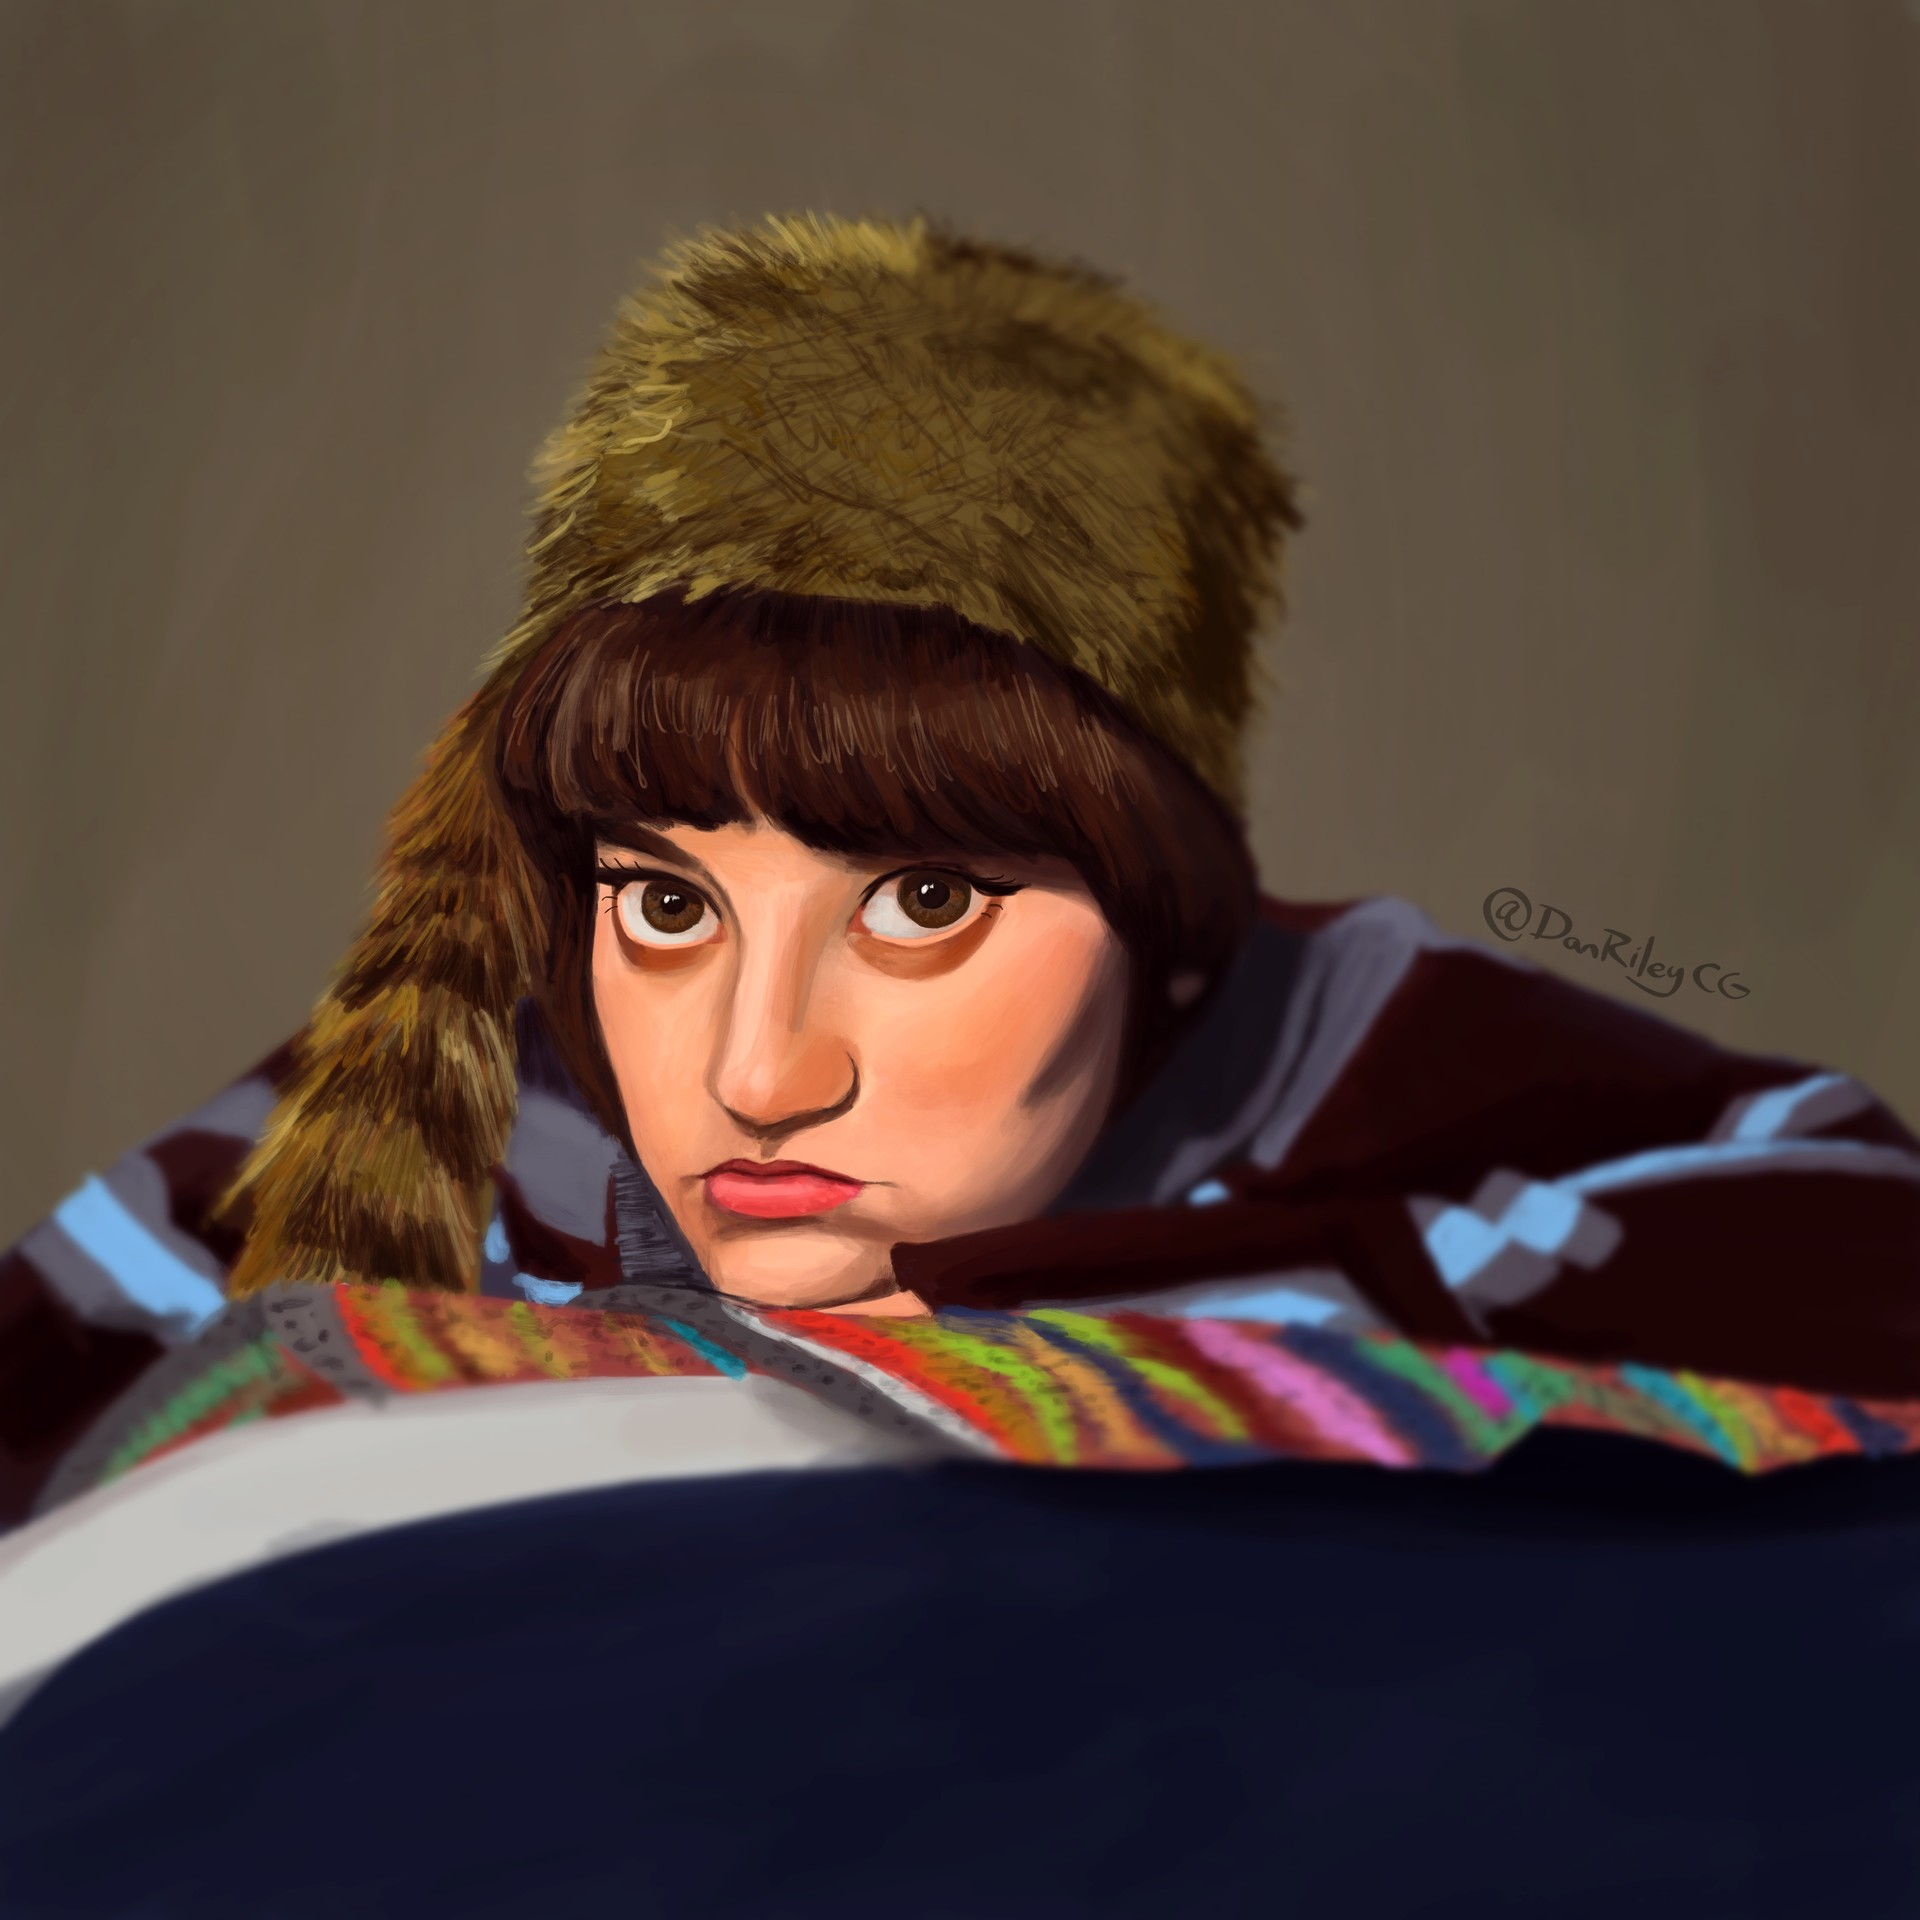 ArtStation - Girl from (Reddit Gets Drawn), Dan Riley